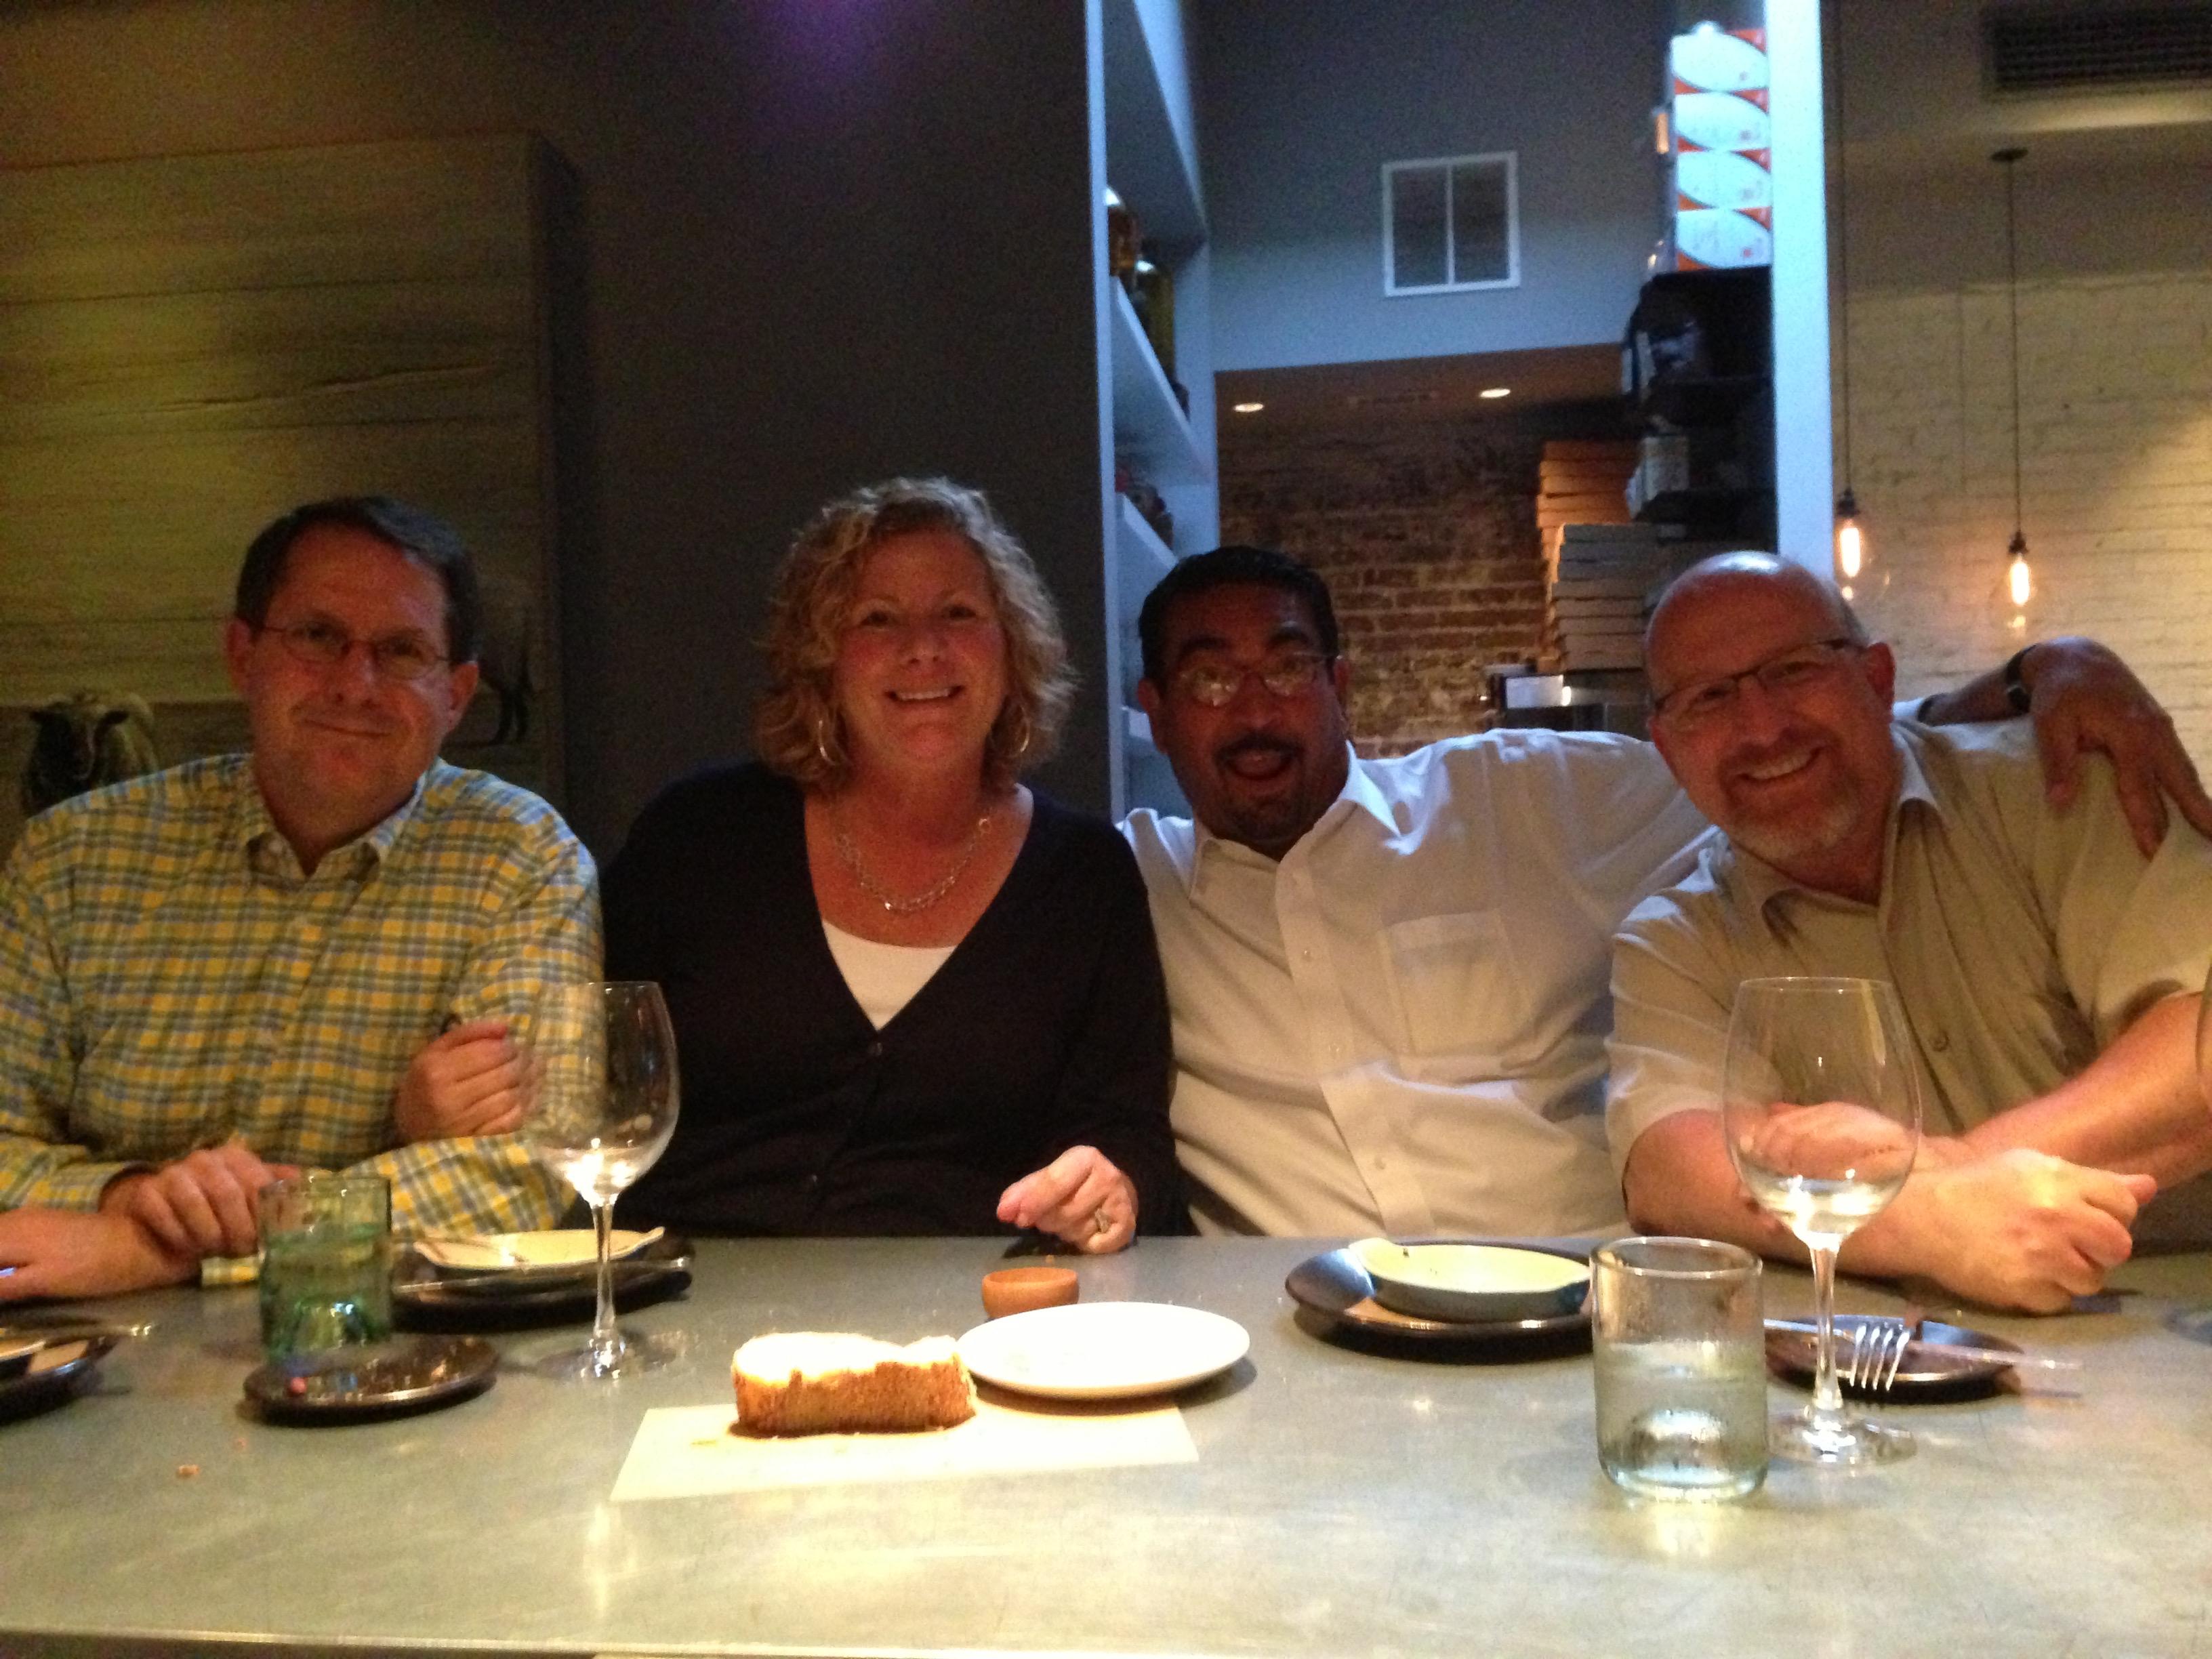 Richard, Collin & Kevin